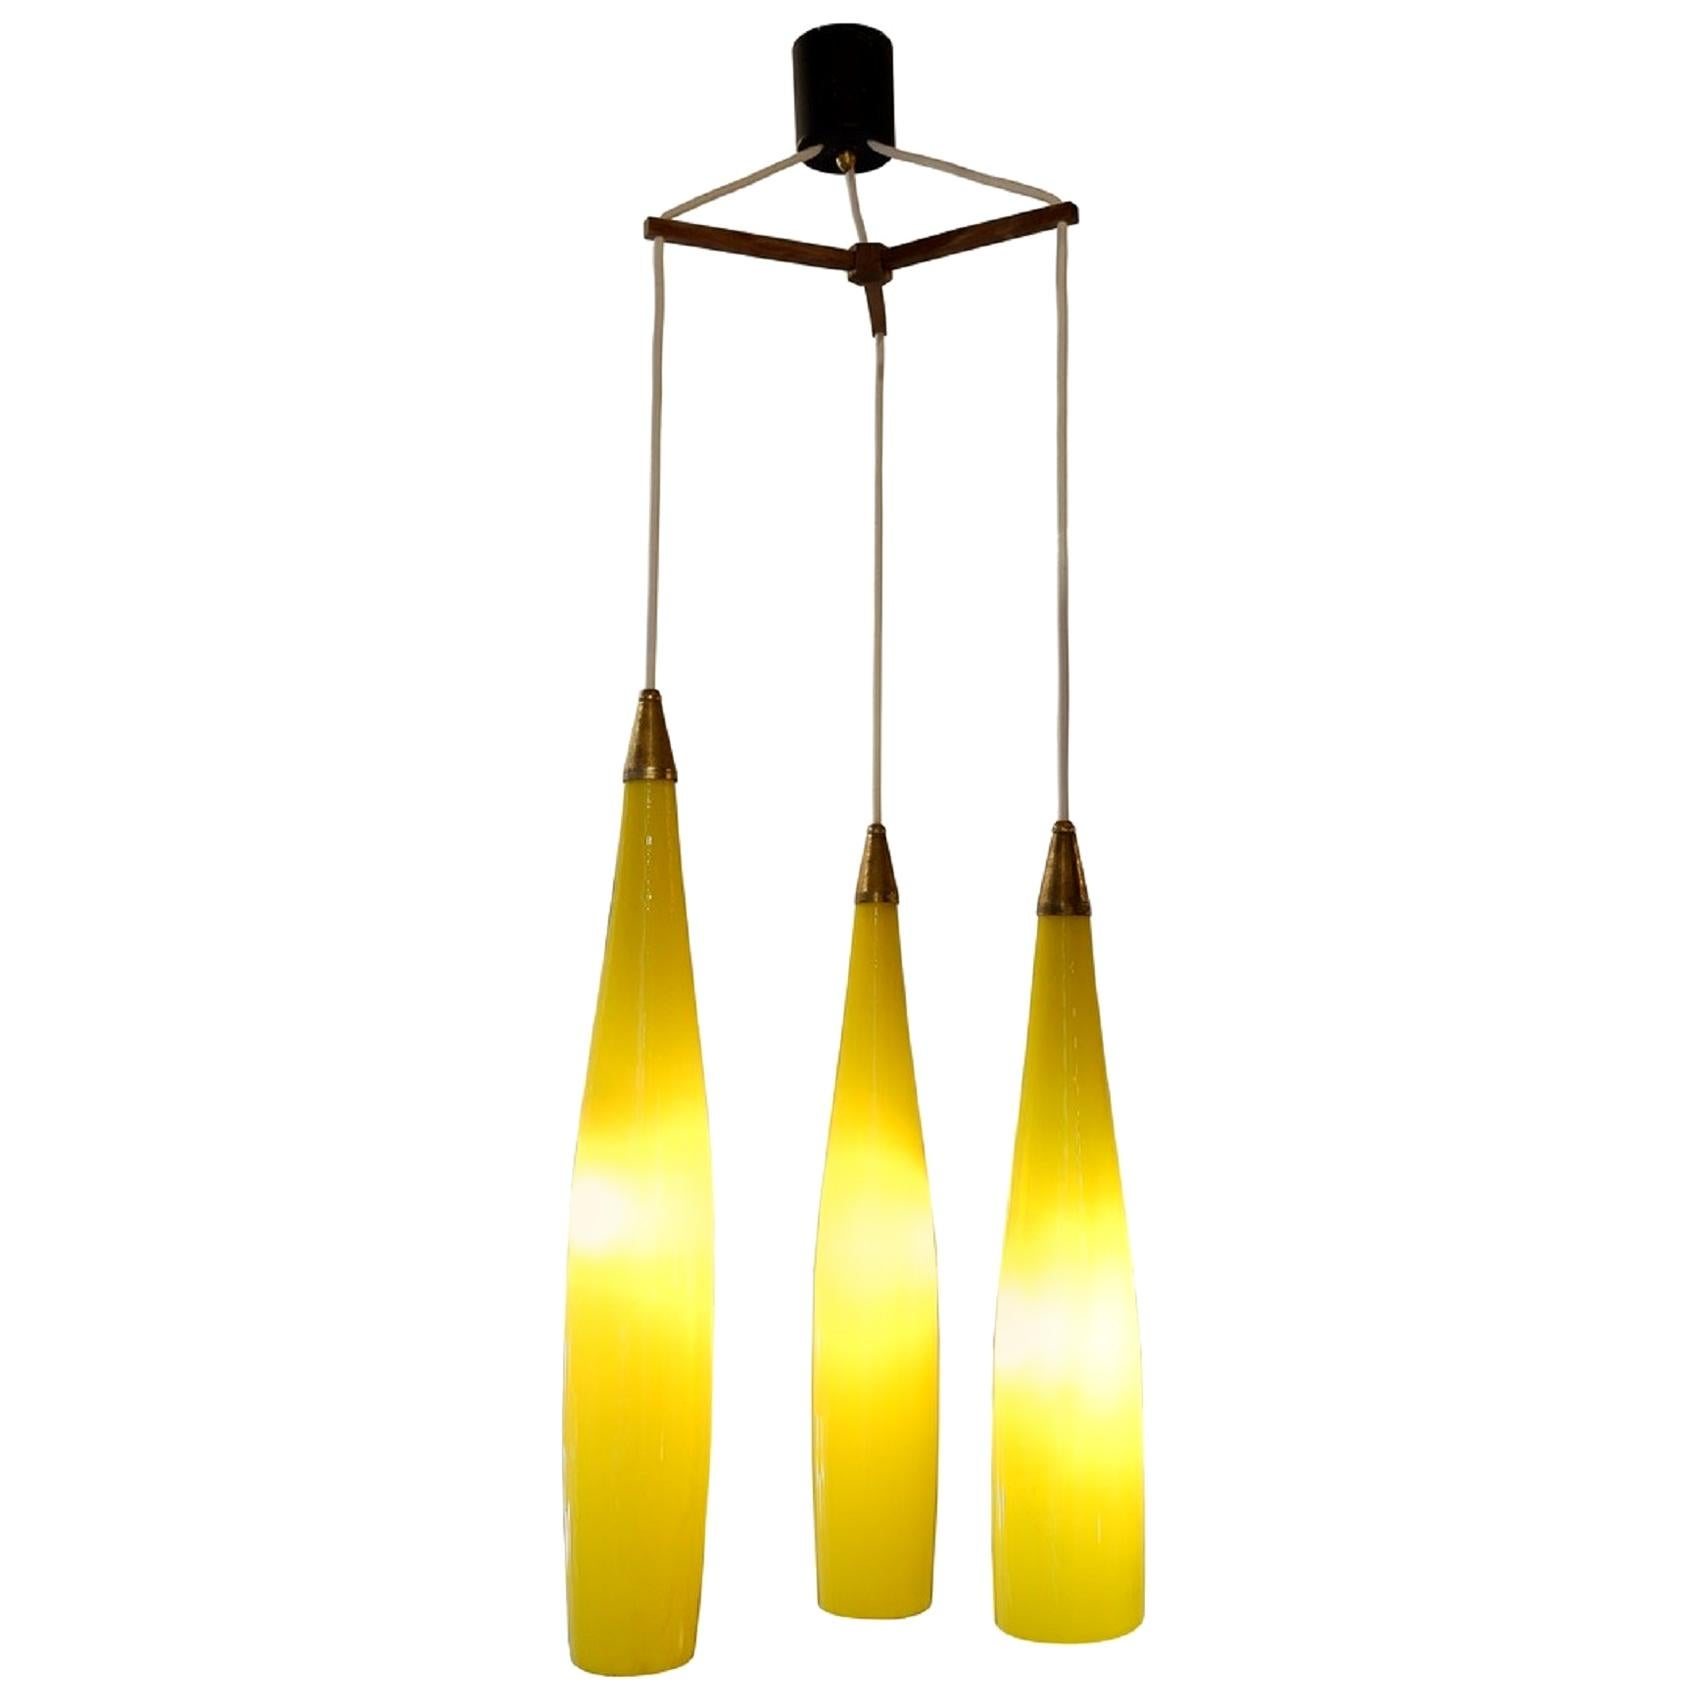 Long Murano Glass Pendant Light by Gino Vistosi for Vistosi